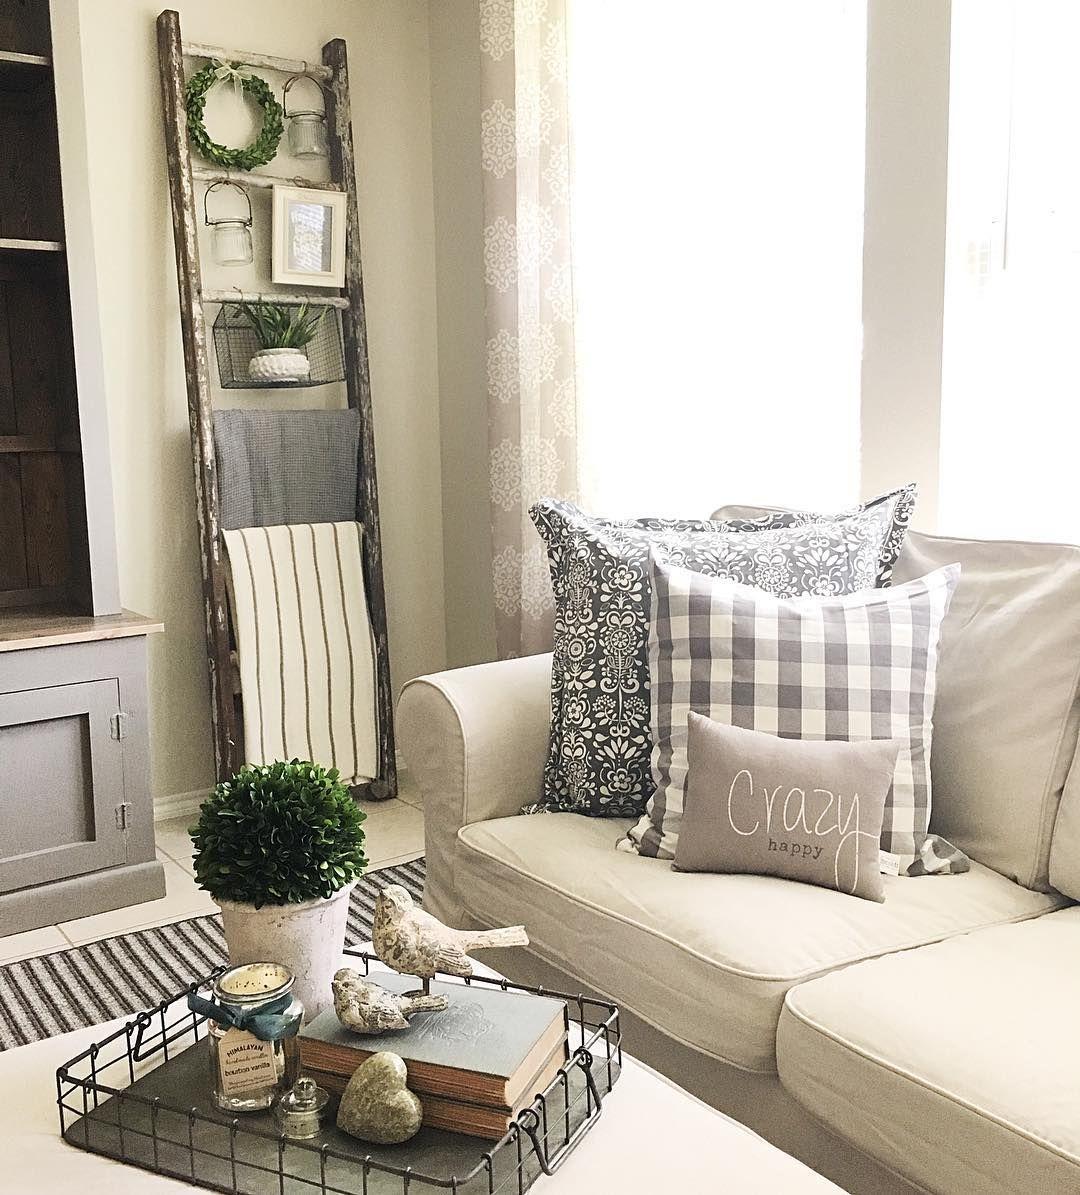 Living Room Decor - Wohnzimmer Dekor   Home Design   Pinterest ...